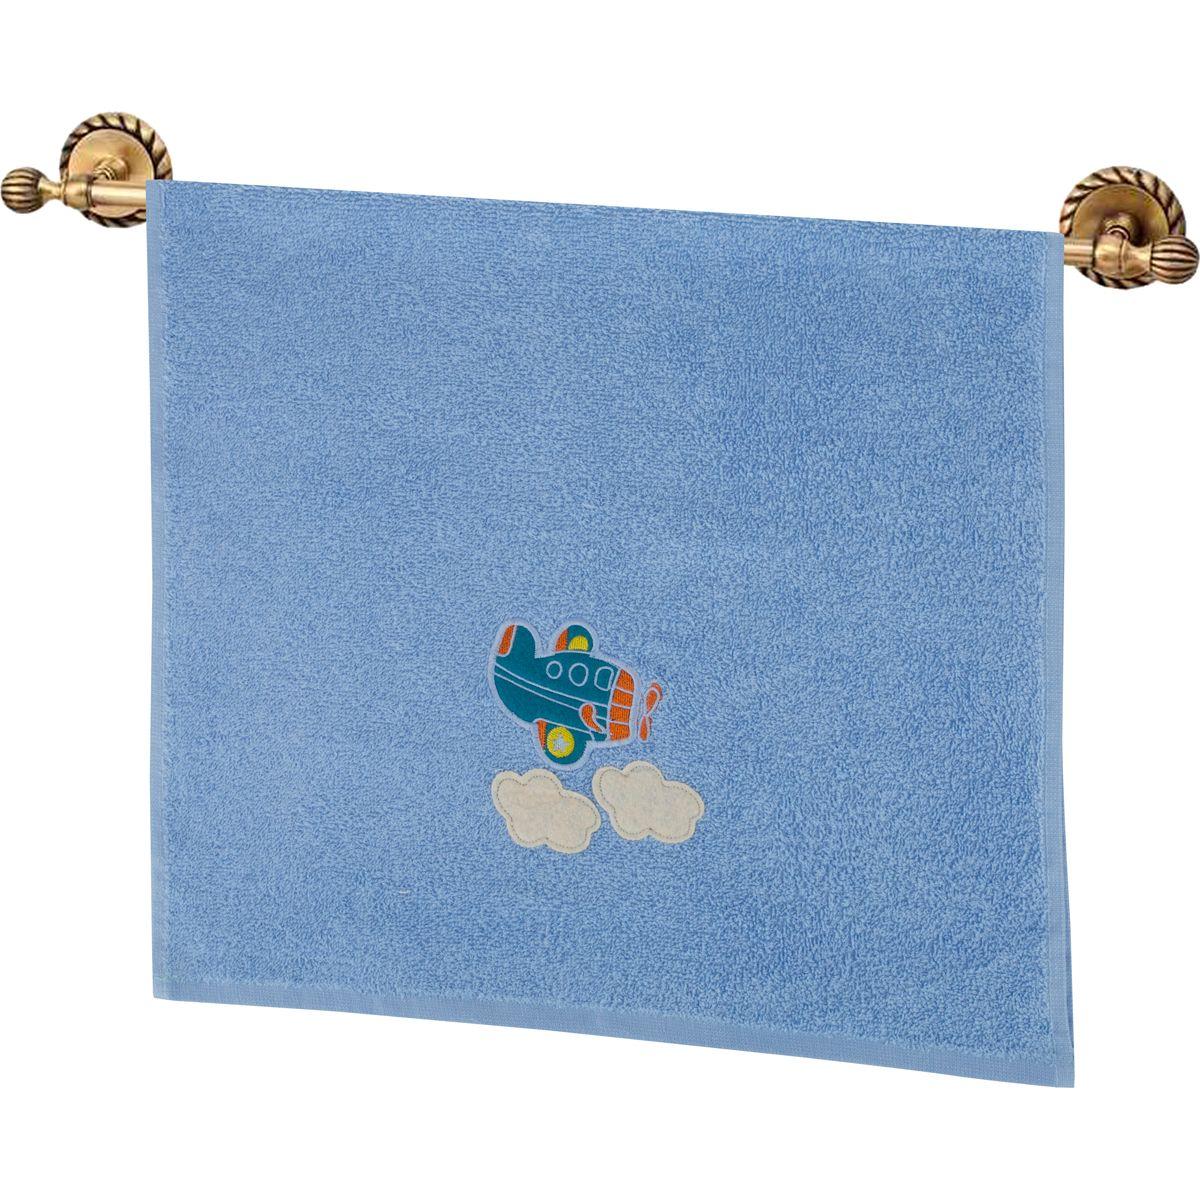 Купить Полотенца Santalino, Полотенце Самолетик Цвет: Голубой (40х70 см), Россия, Махра